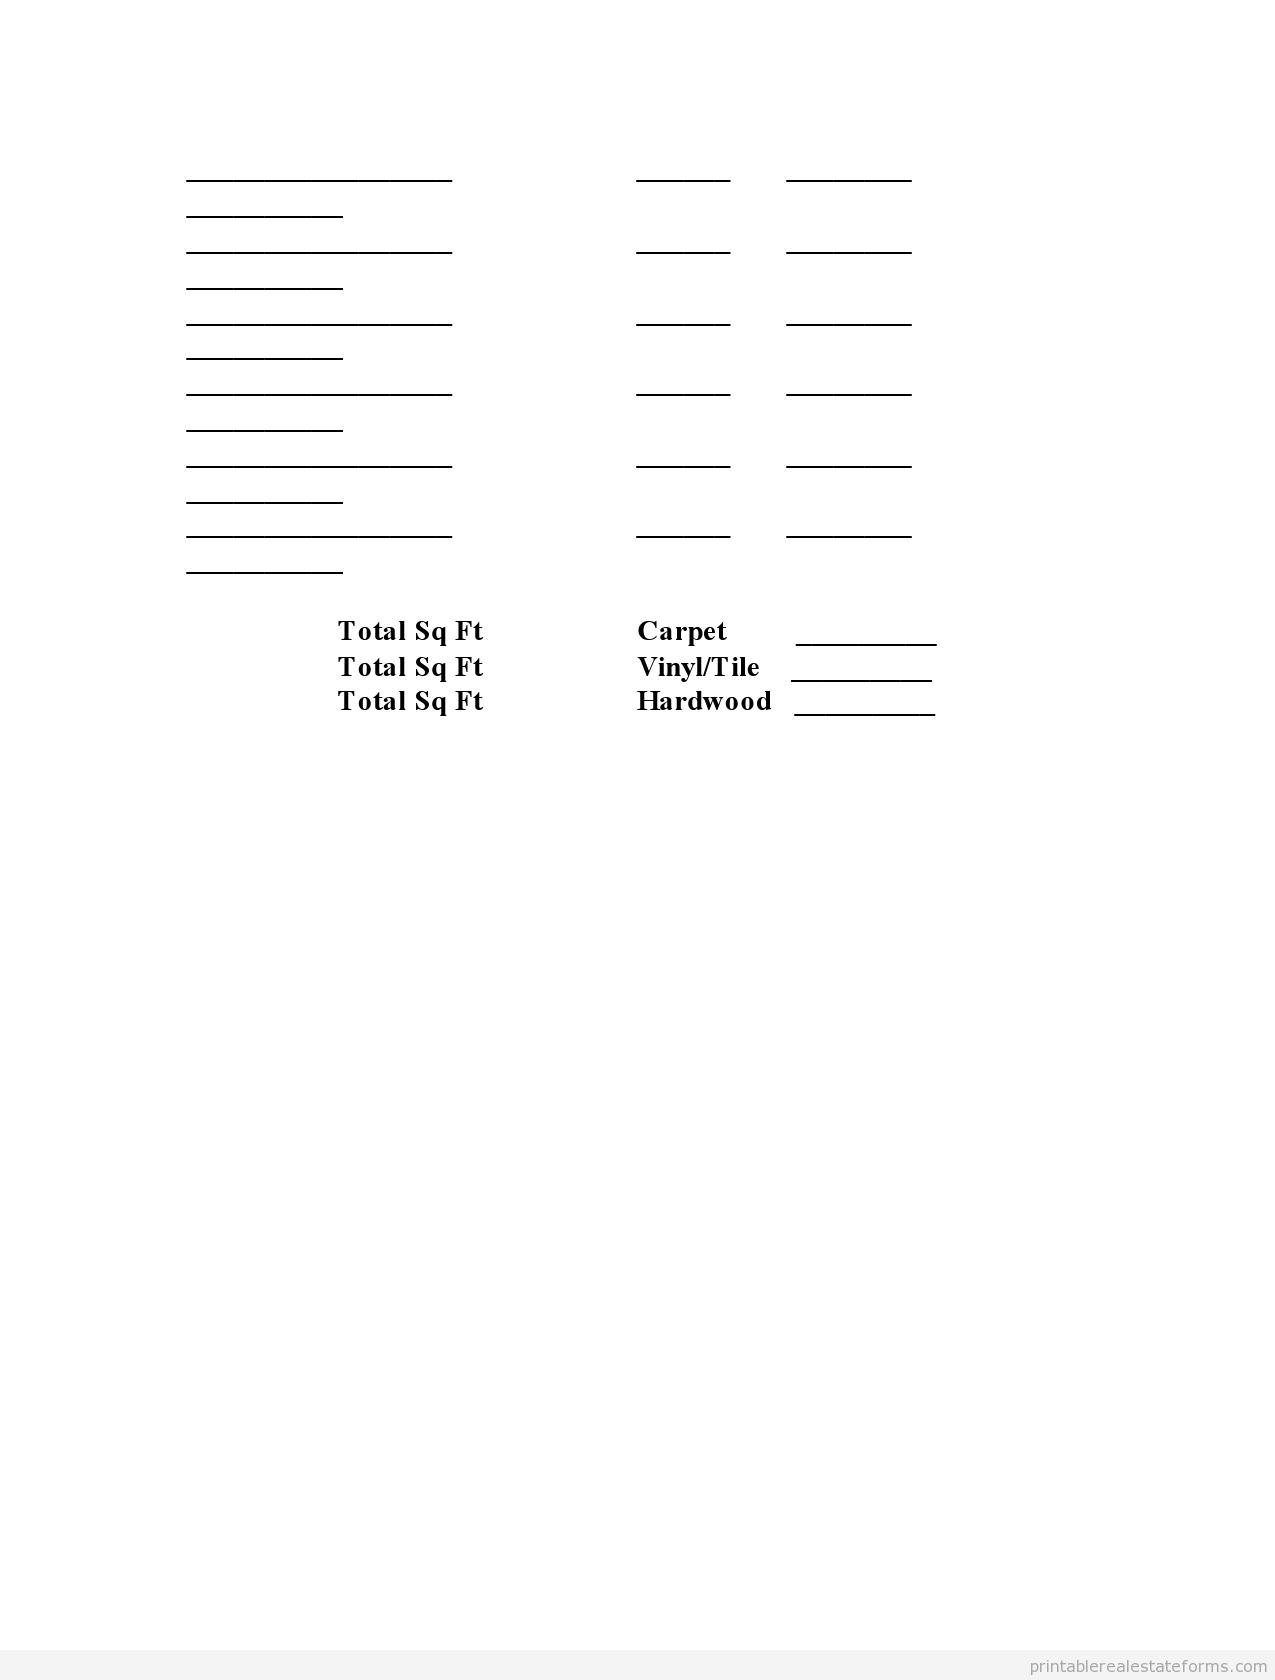 printable prop insp flooring estimate worksheet template  printable prop insp flooring estimate worksheet template 2015